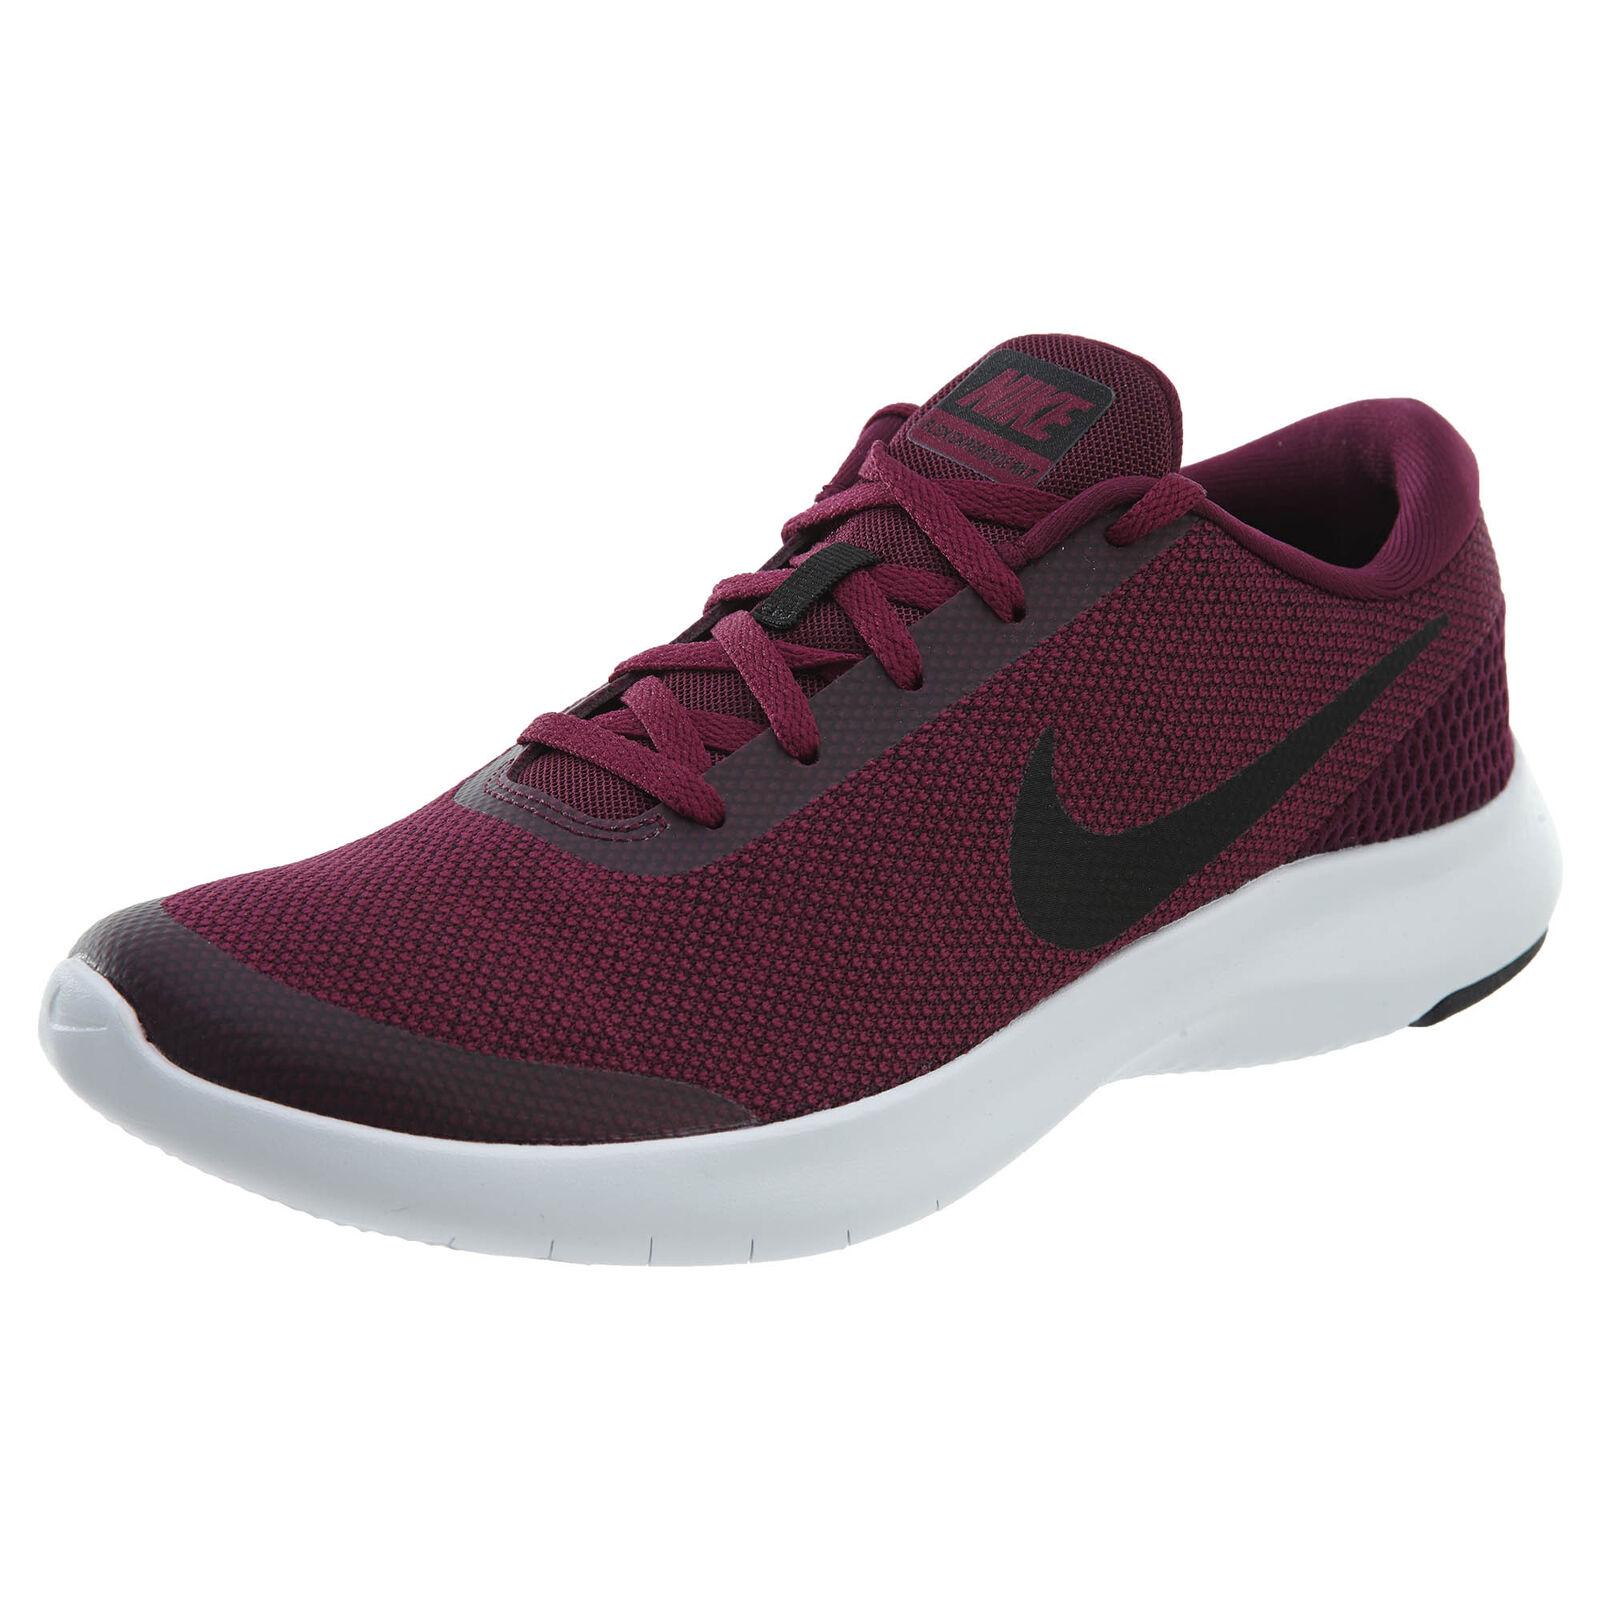 Nike Nike Nike Mens Flex Experience RN 7 Running shoes 908985-600 d9d9b6